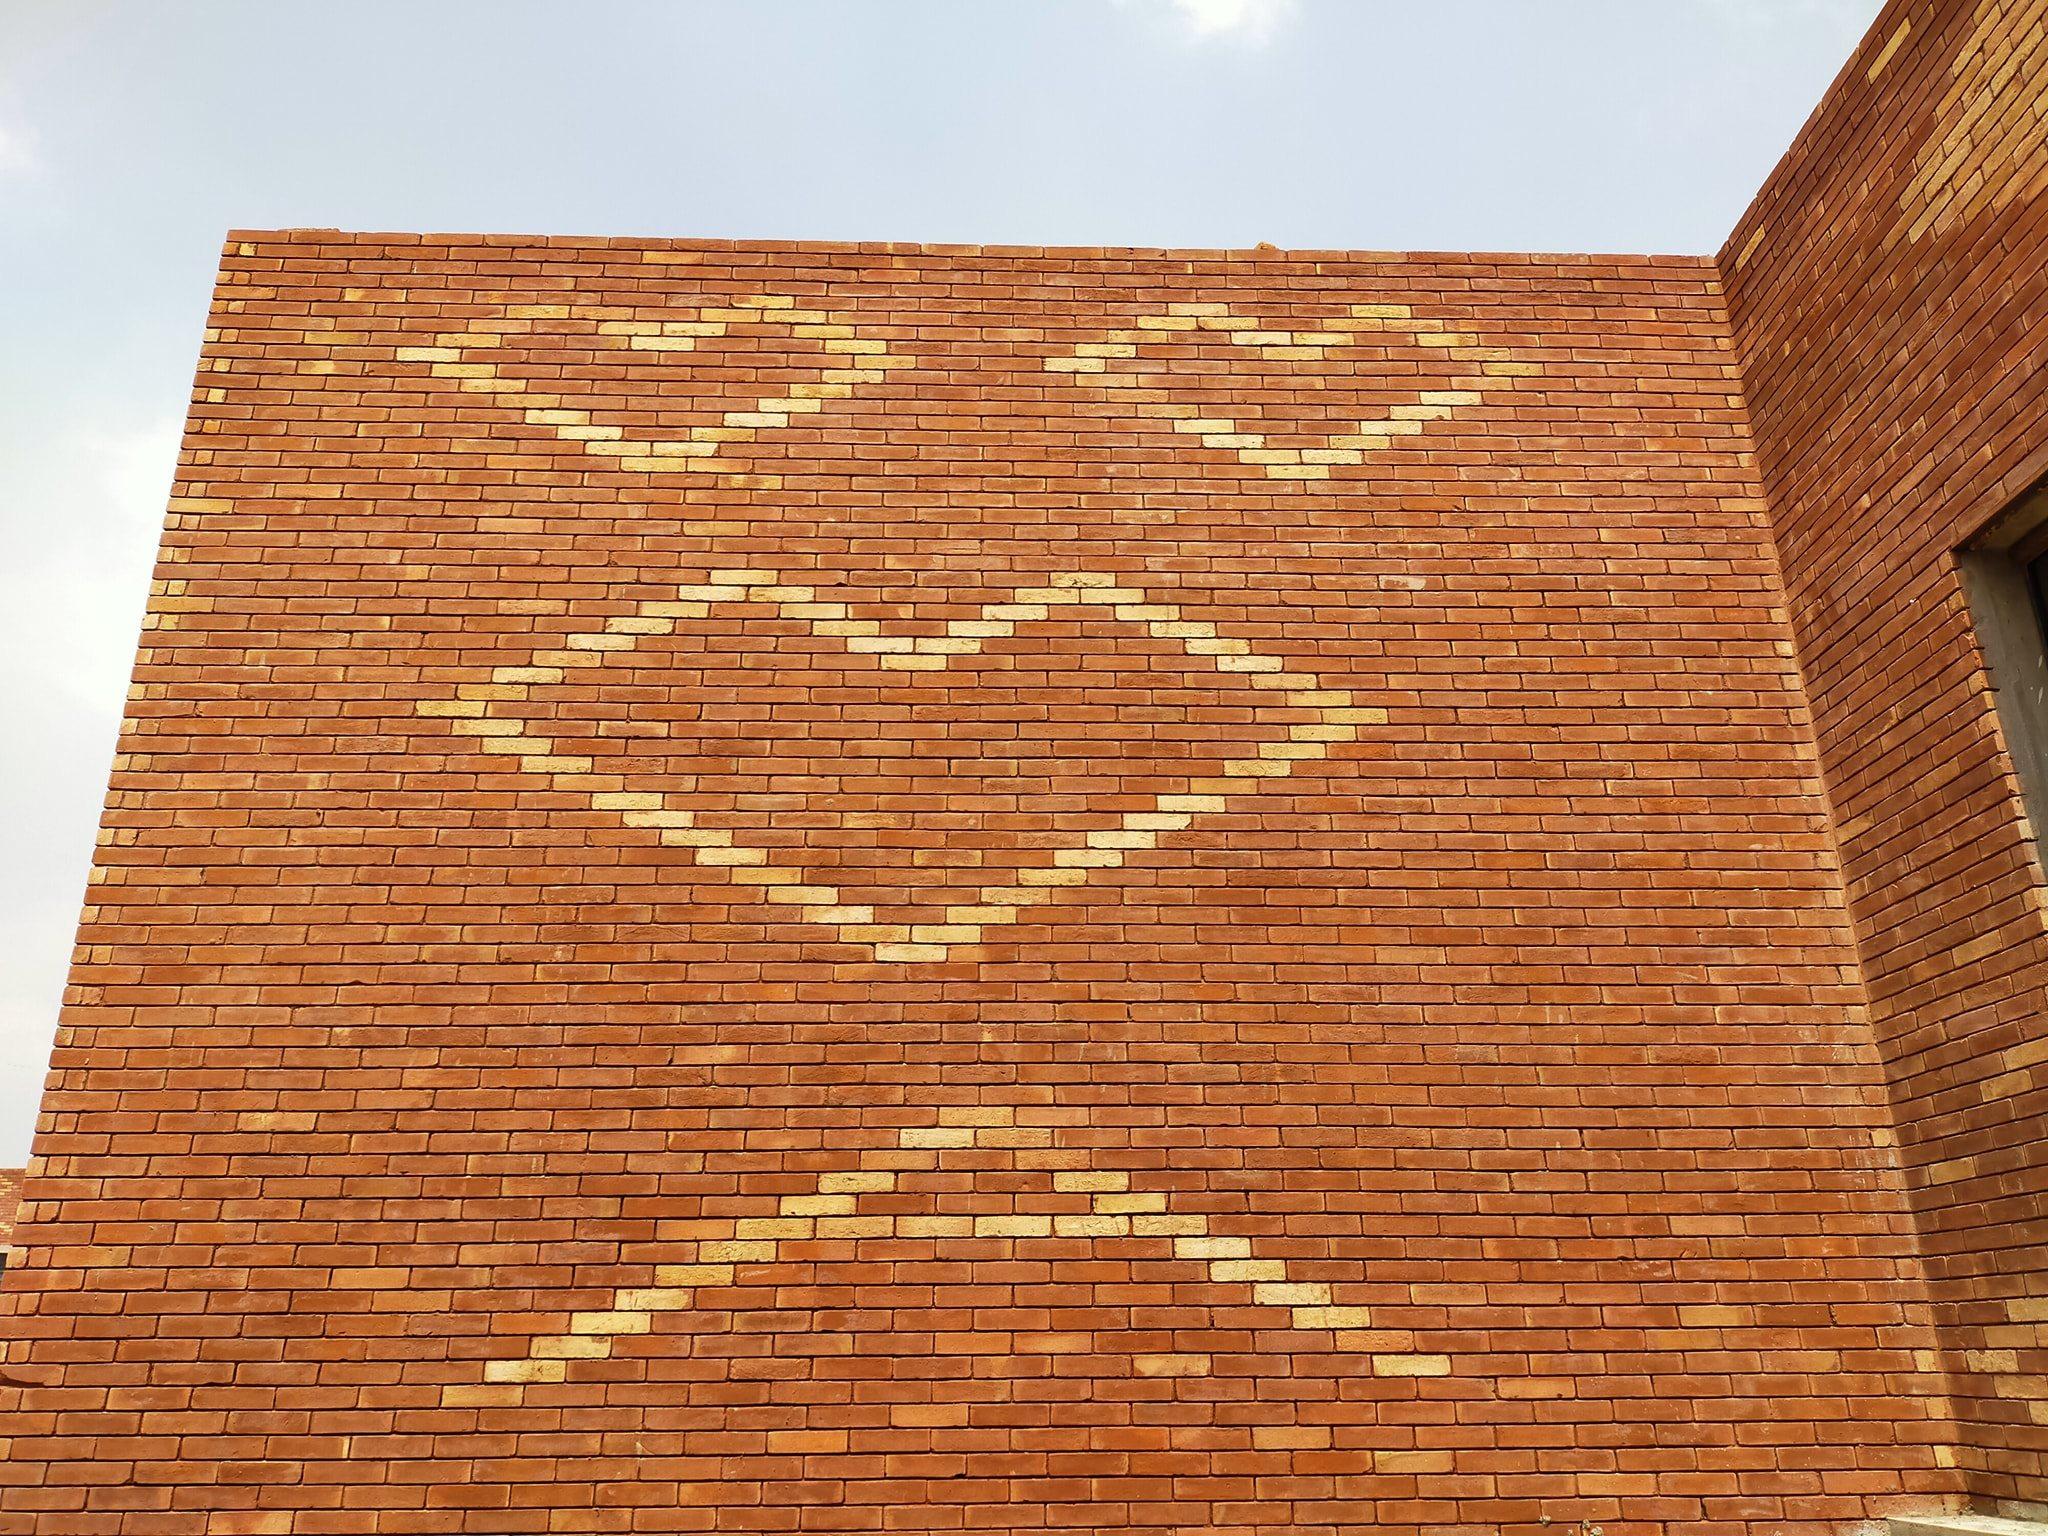 7 Lahori gutka bricks face tiles in pakistan